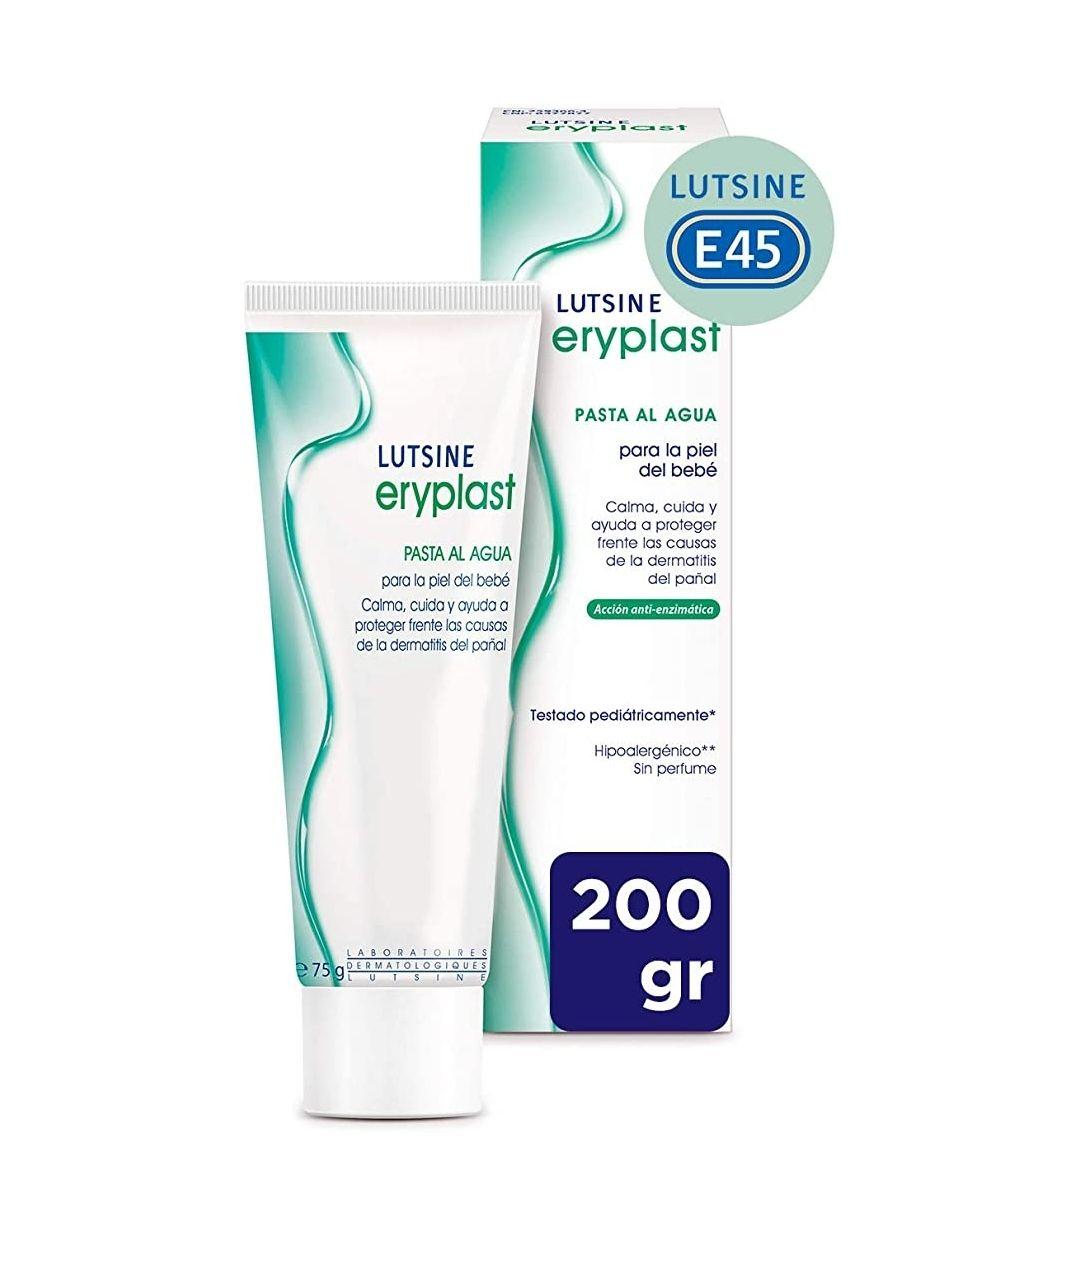 Eryplast Lutsine E45 - Pasta al Agua Crema Pañal Bebé - 200gr x2 (Descuento al tramitar)